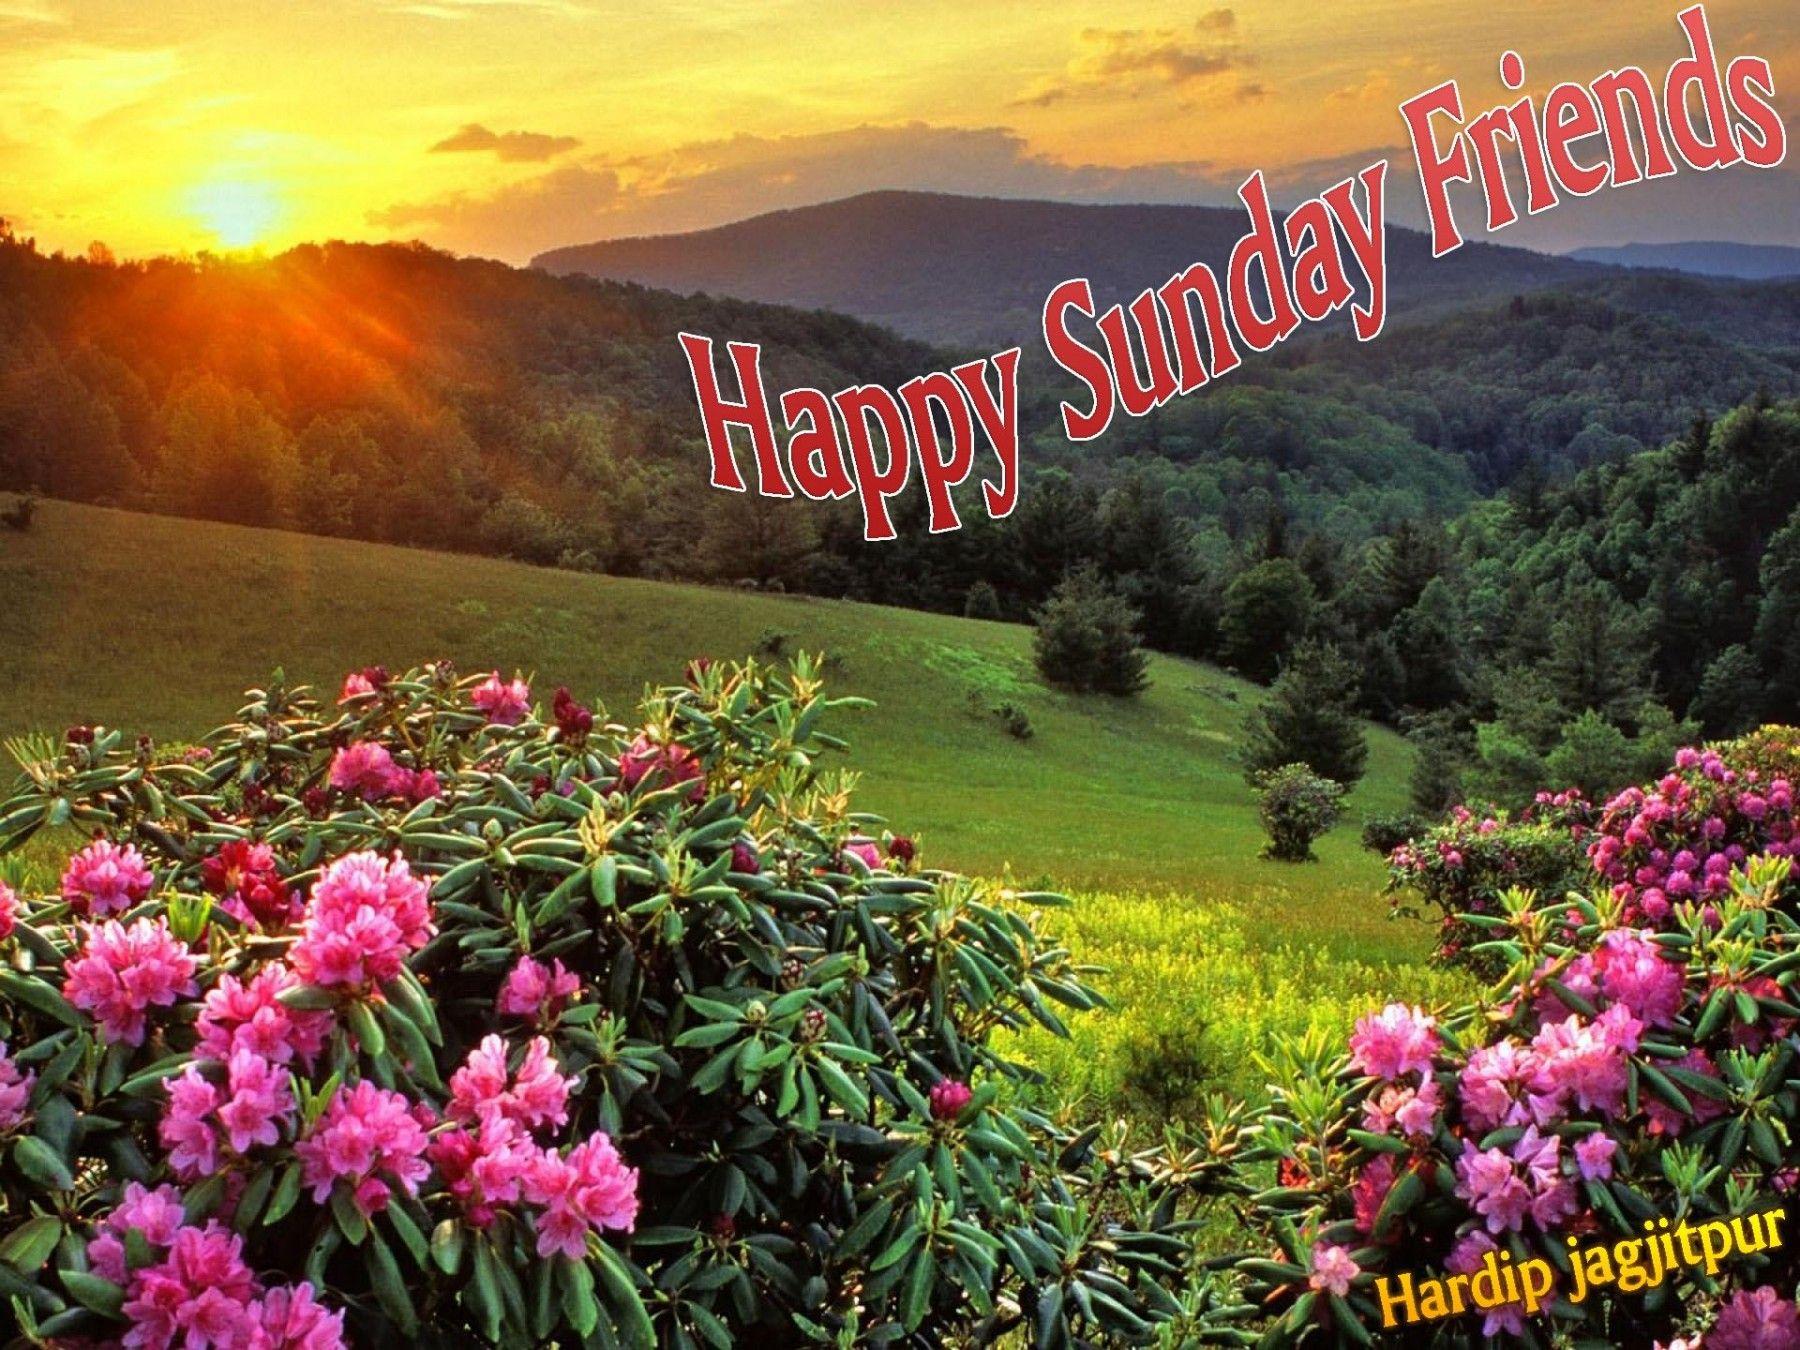 Happy Sunday Friends Scenery Wallpaper Hd Nature Wallpapers Landscape Wallpaper